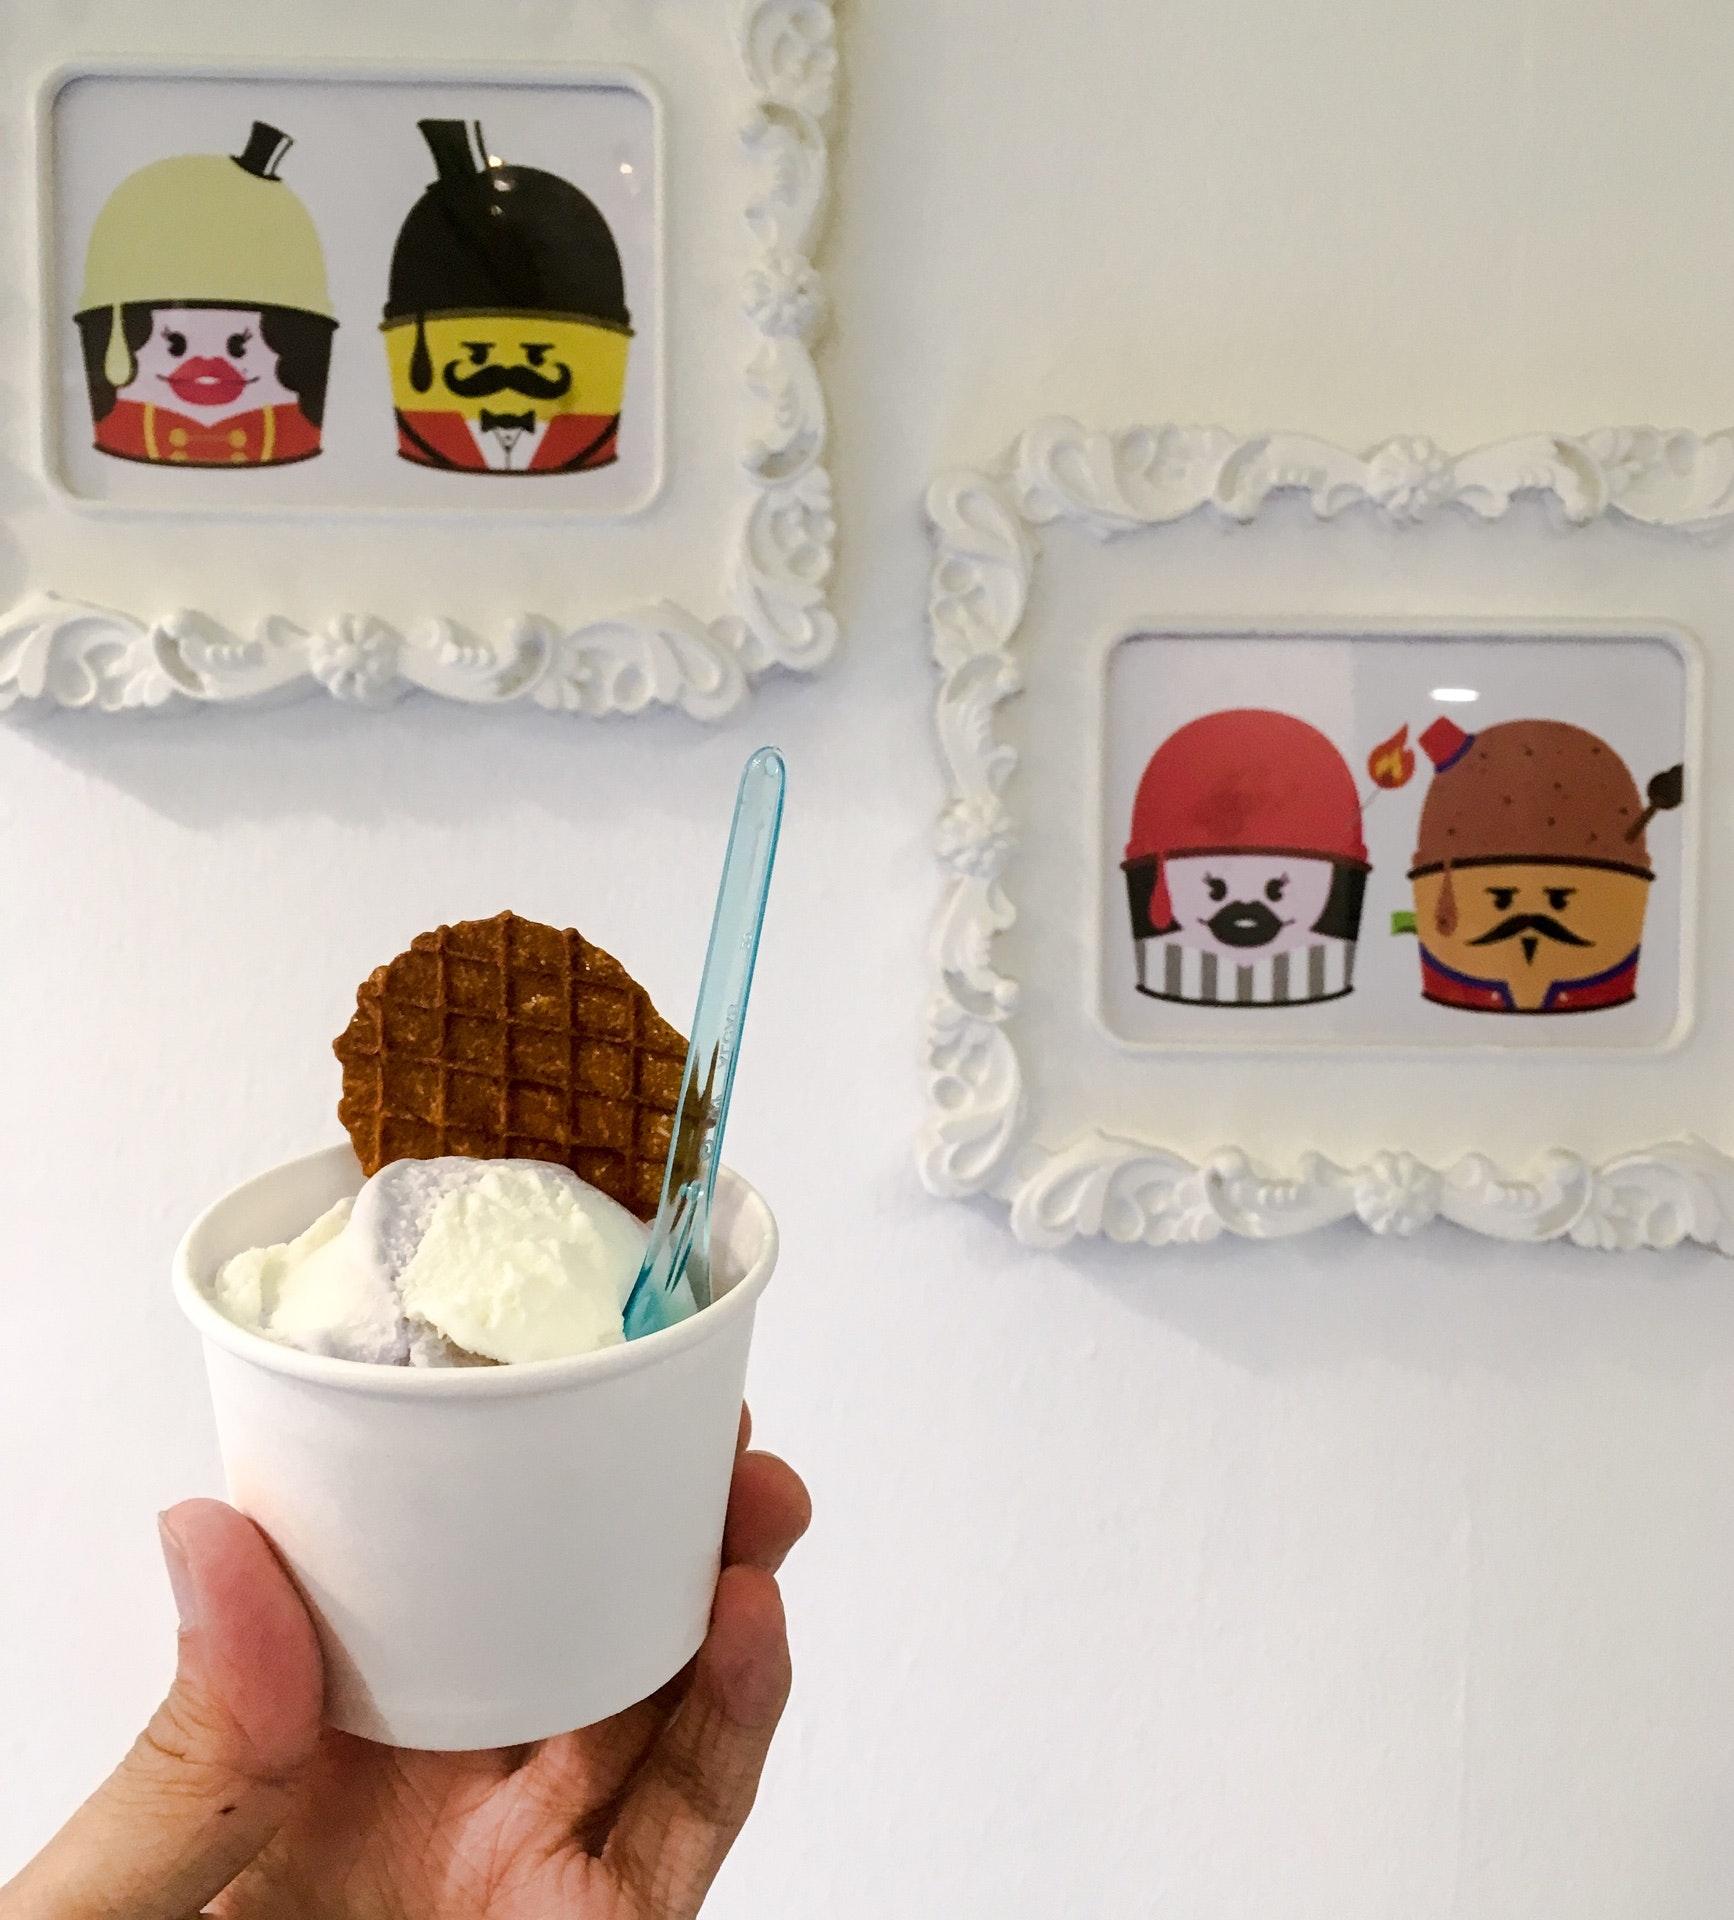 Taro Yam & Coconut Cream